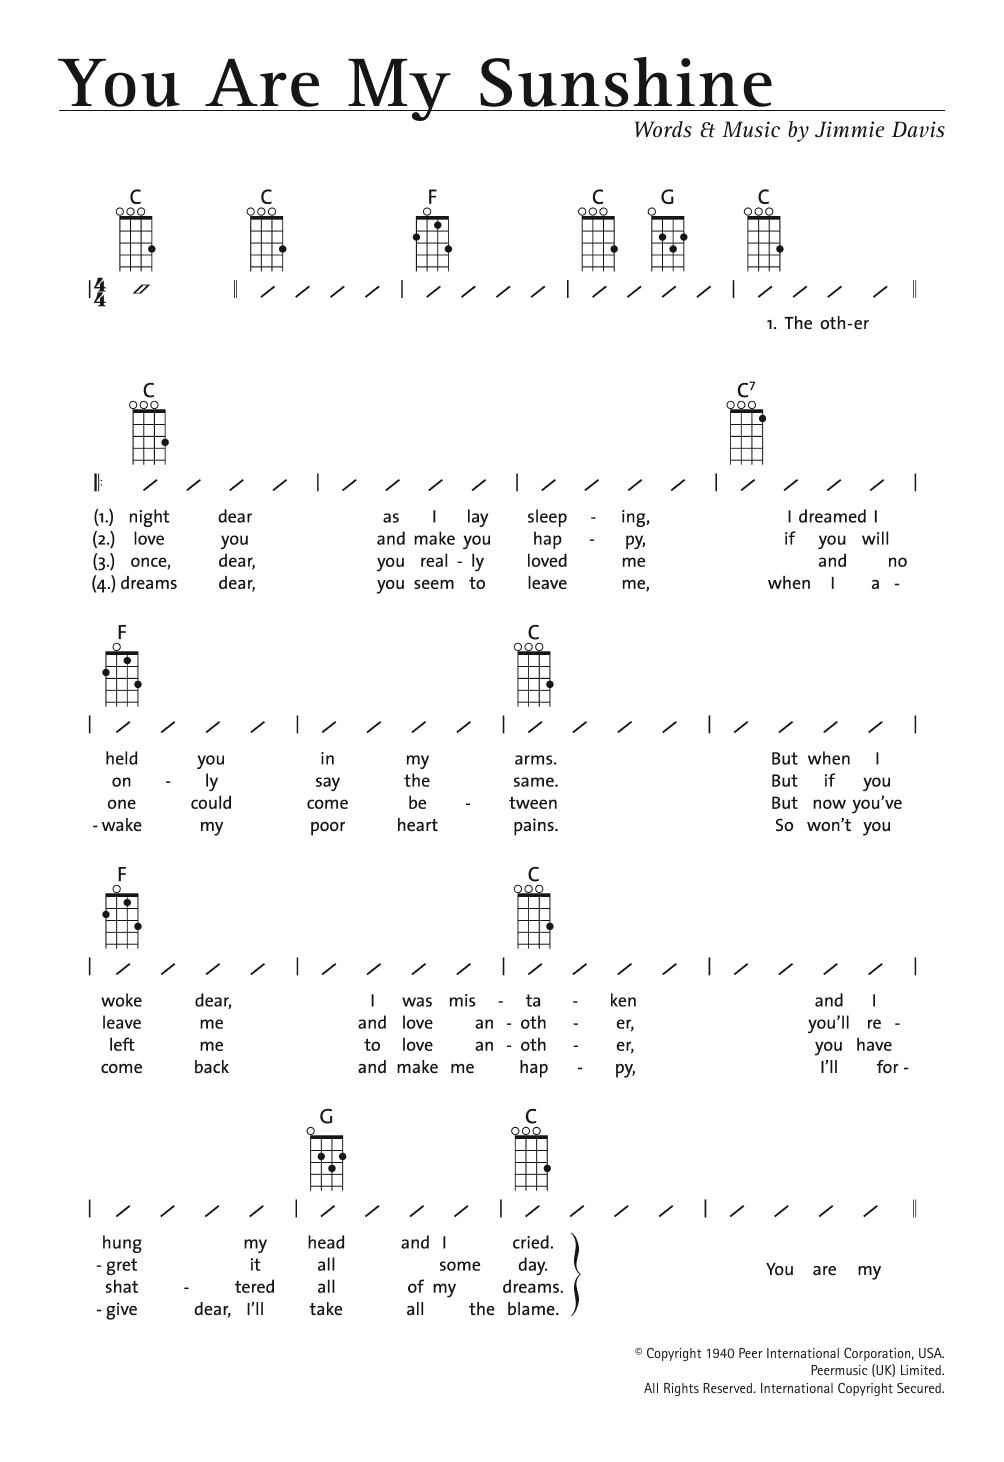 You Are My Sunshine Chords You Are My Sunshine Sheet Music Jimmie Davis Ukulele With